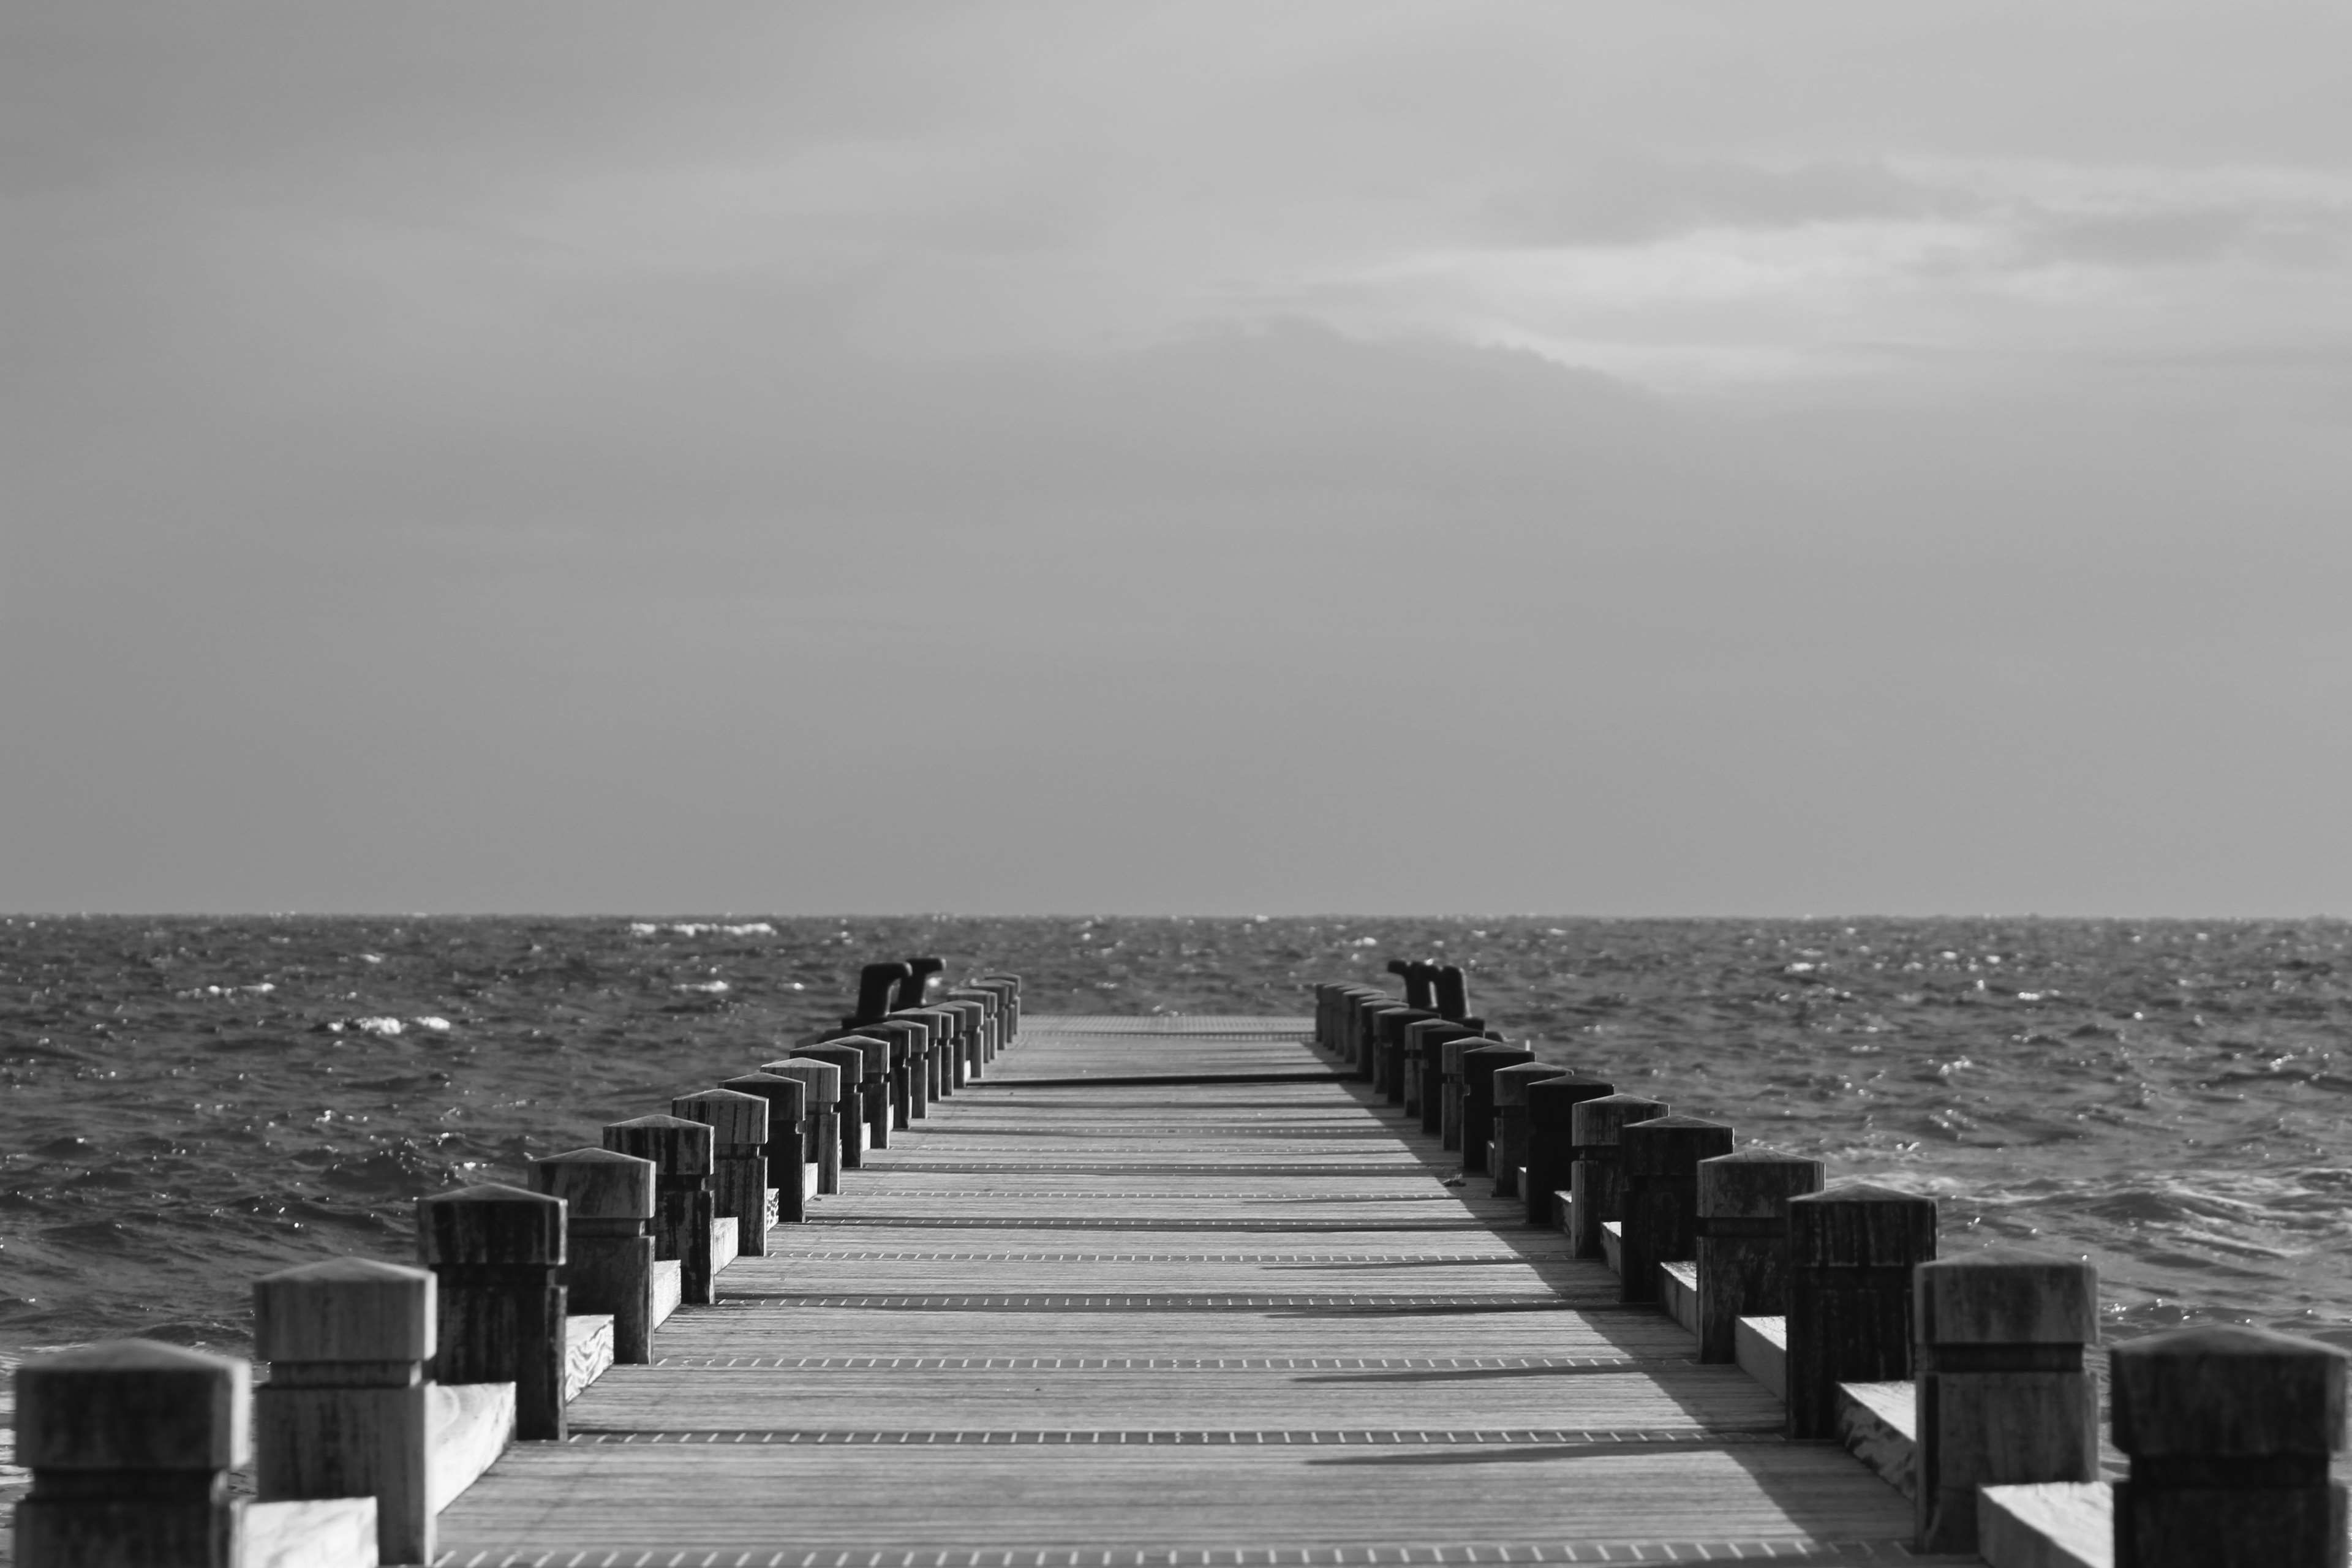 Beach Black And White Boardwalk Clouds Cloudy Sky Dock Grey Sky Horizon Ocean Pier Sea Seascape Sky Water Waves Seascape Sky Water Waves Wallpaper sky clouds pier sea horizon